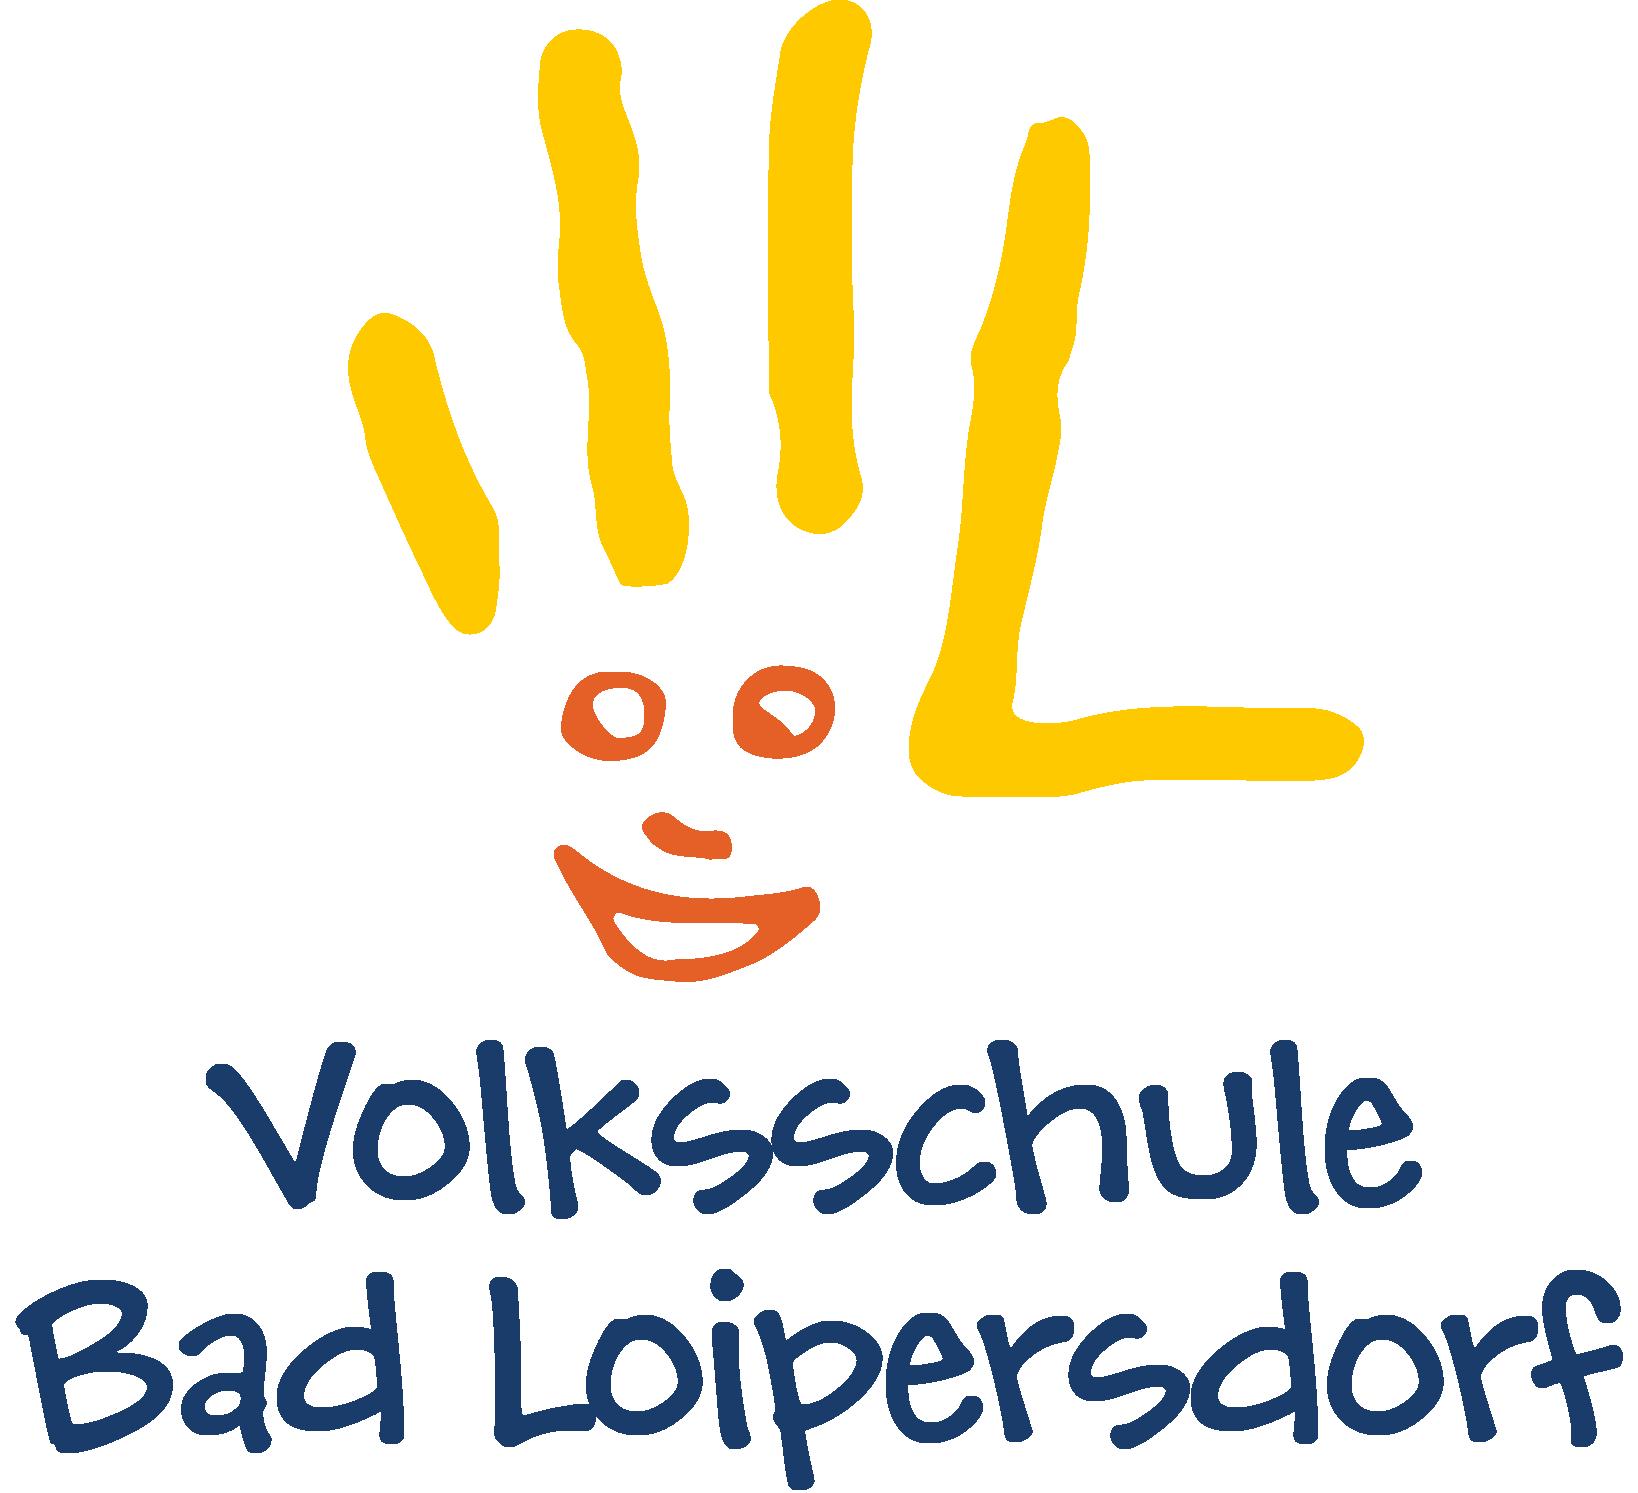 Volksschule Bad Loipersdorf Logo